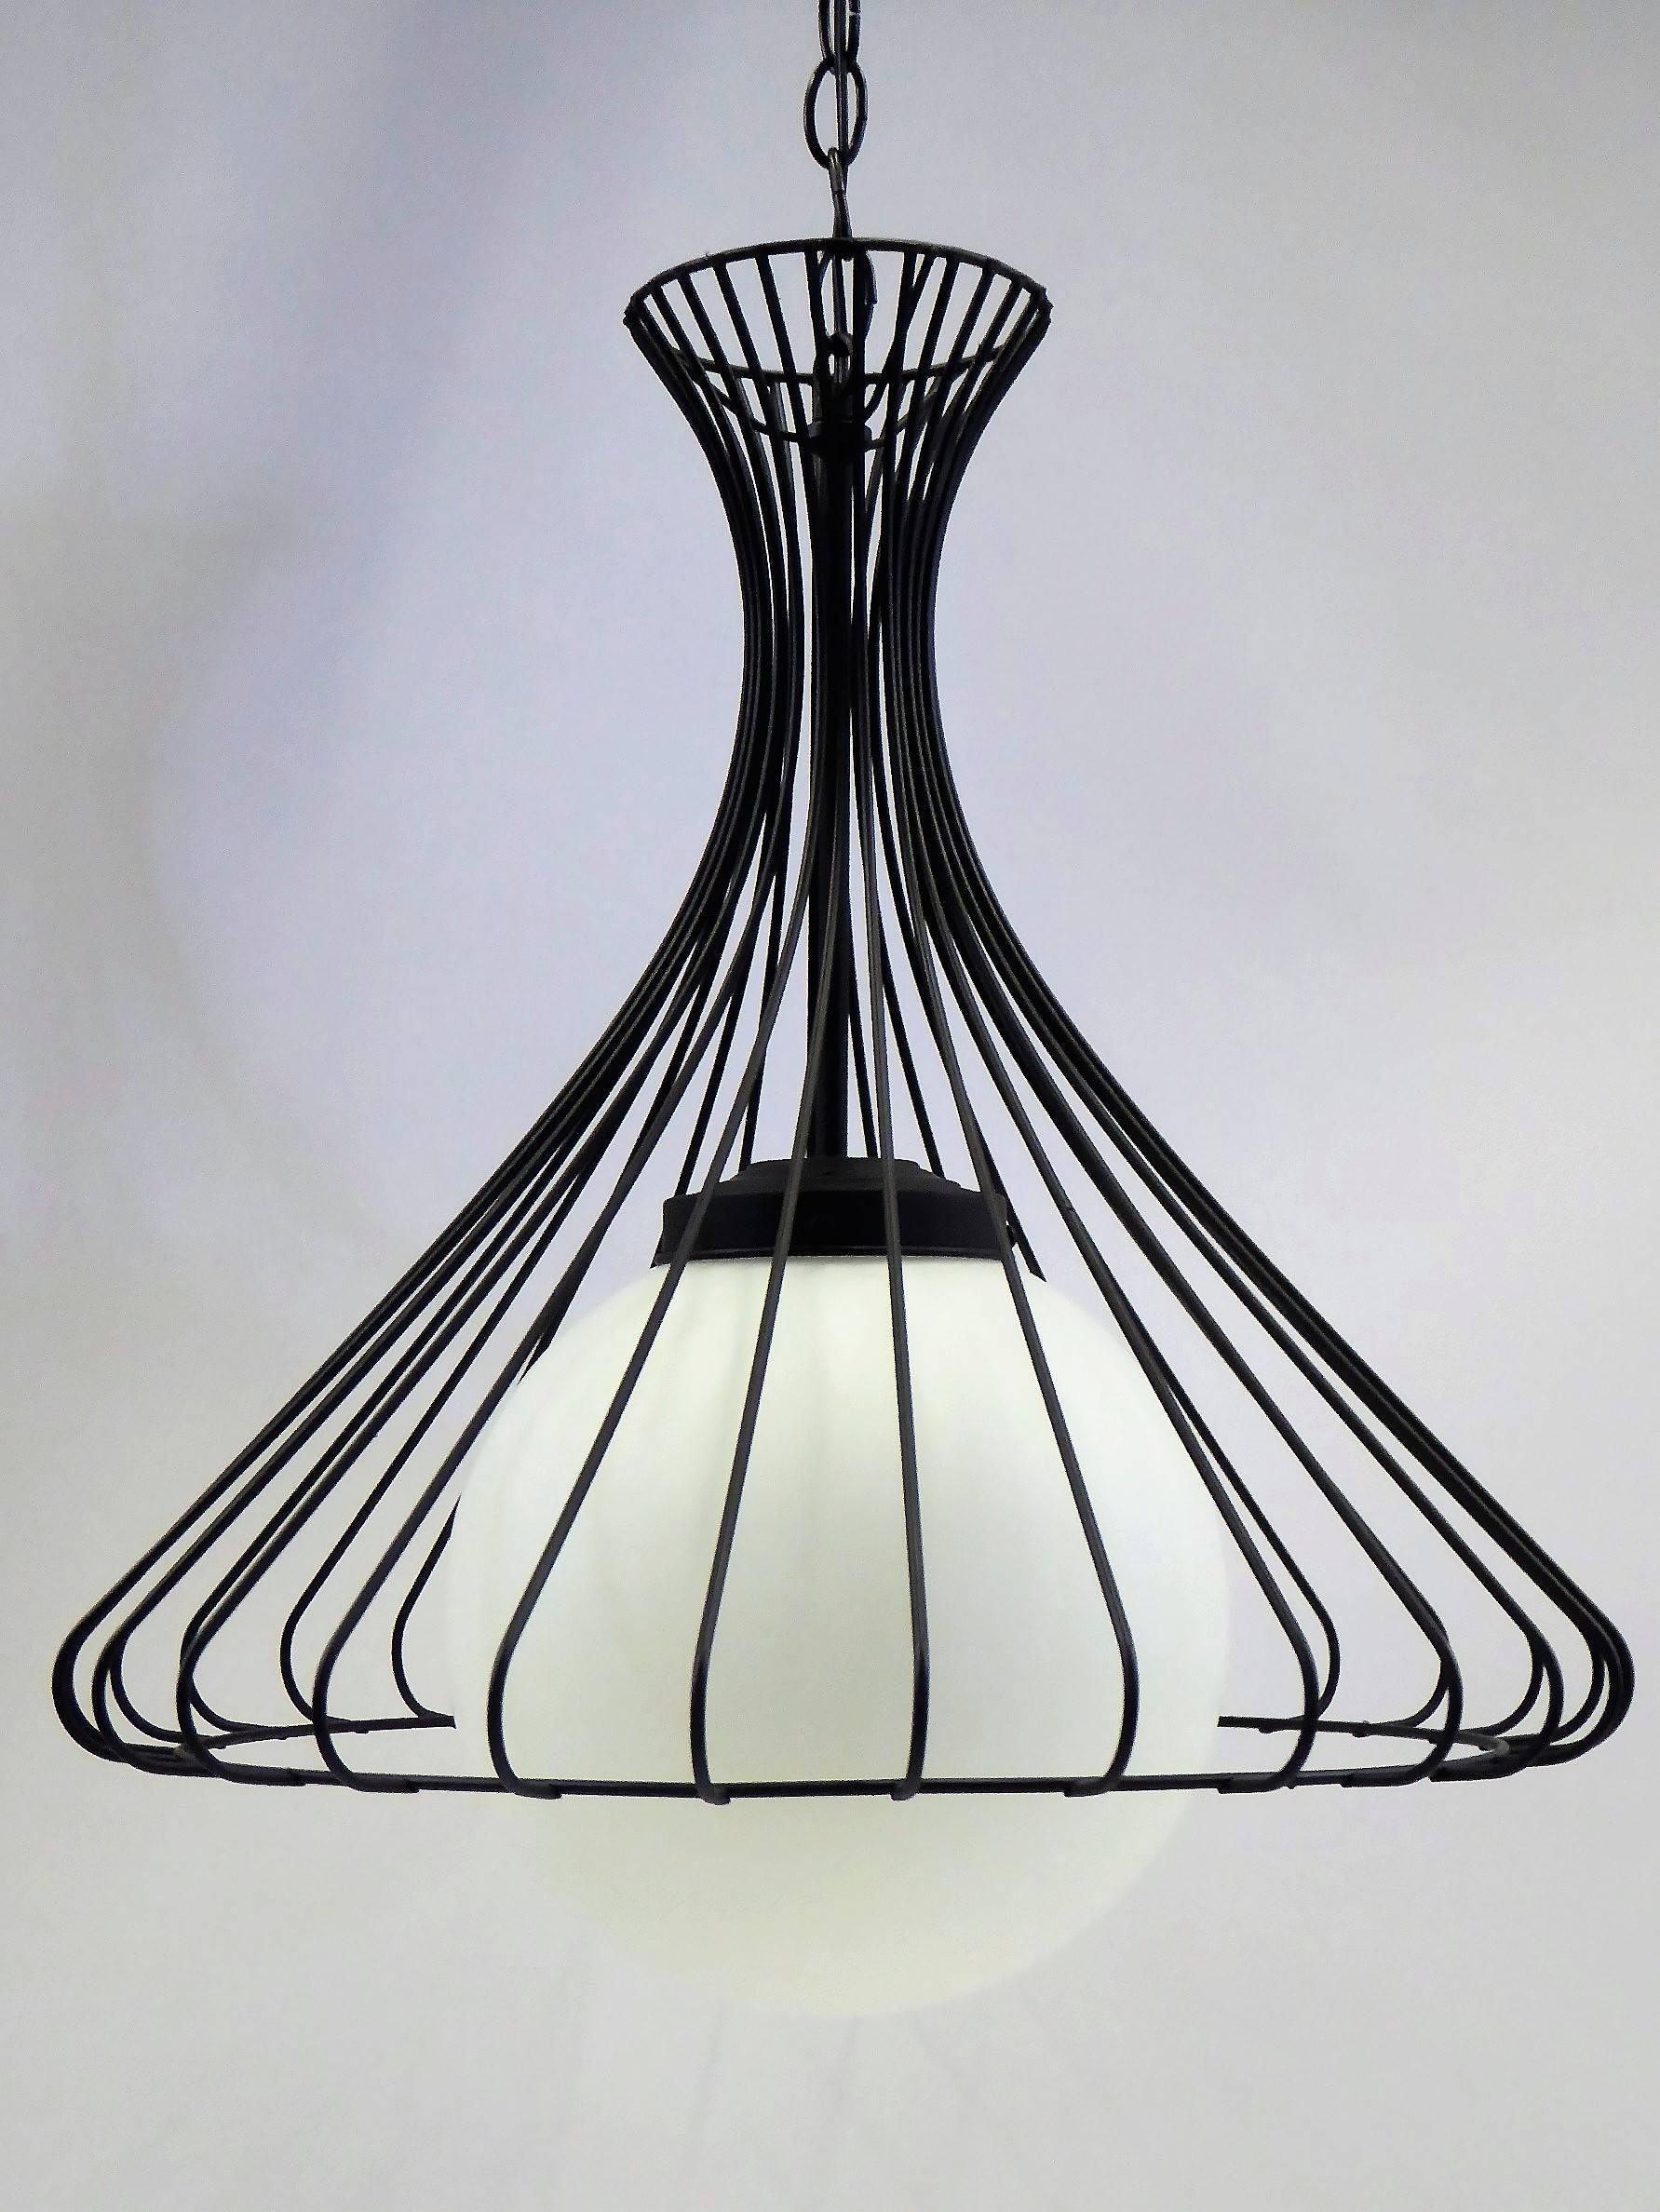 1950s Satin Glass Globe Chandelier with Sculptural Steel Wire Bell ...